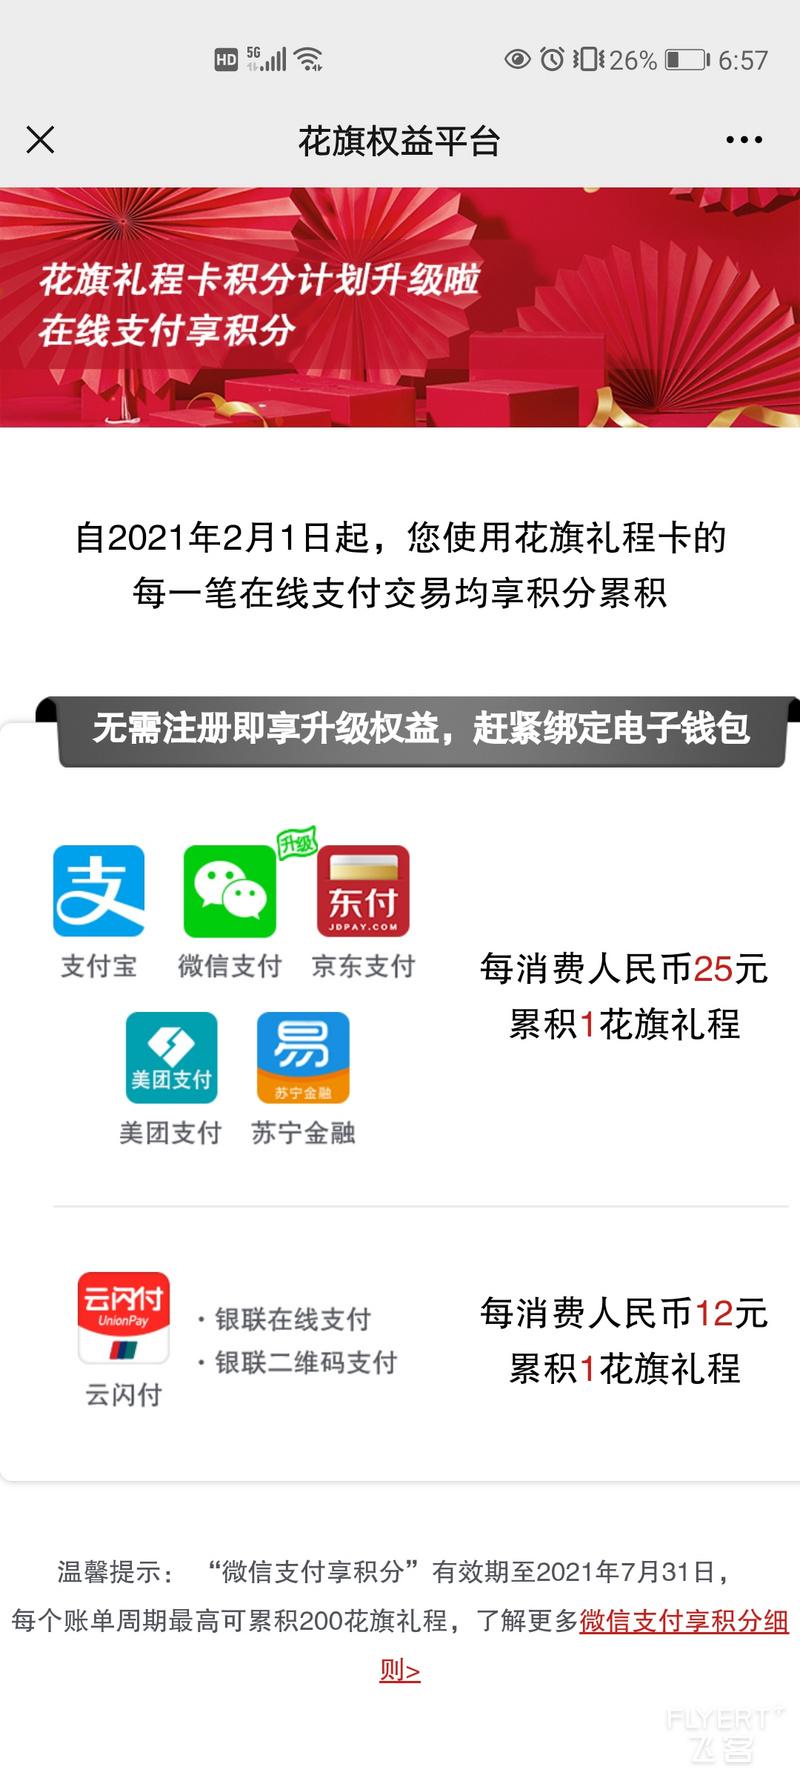 Screenshot_20210613_185714_com.tencent.mm.jpg